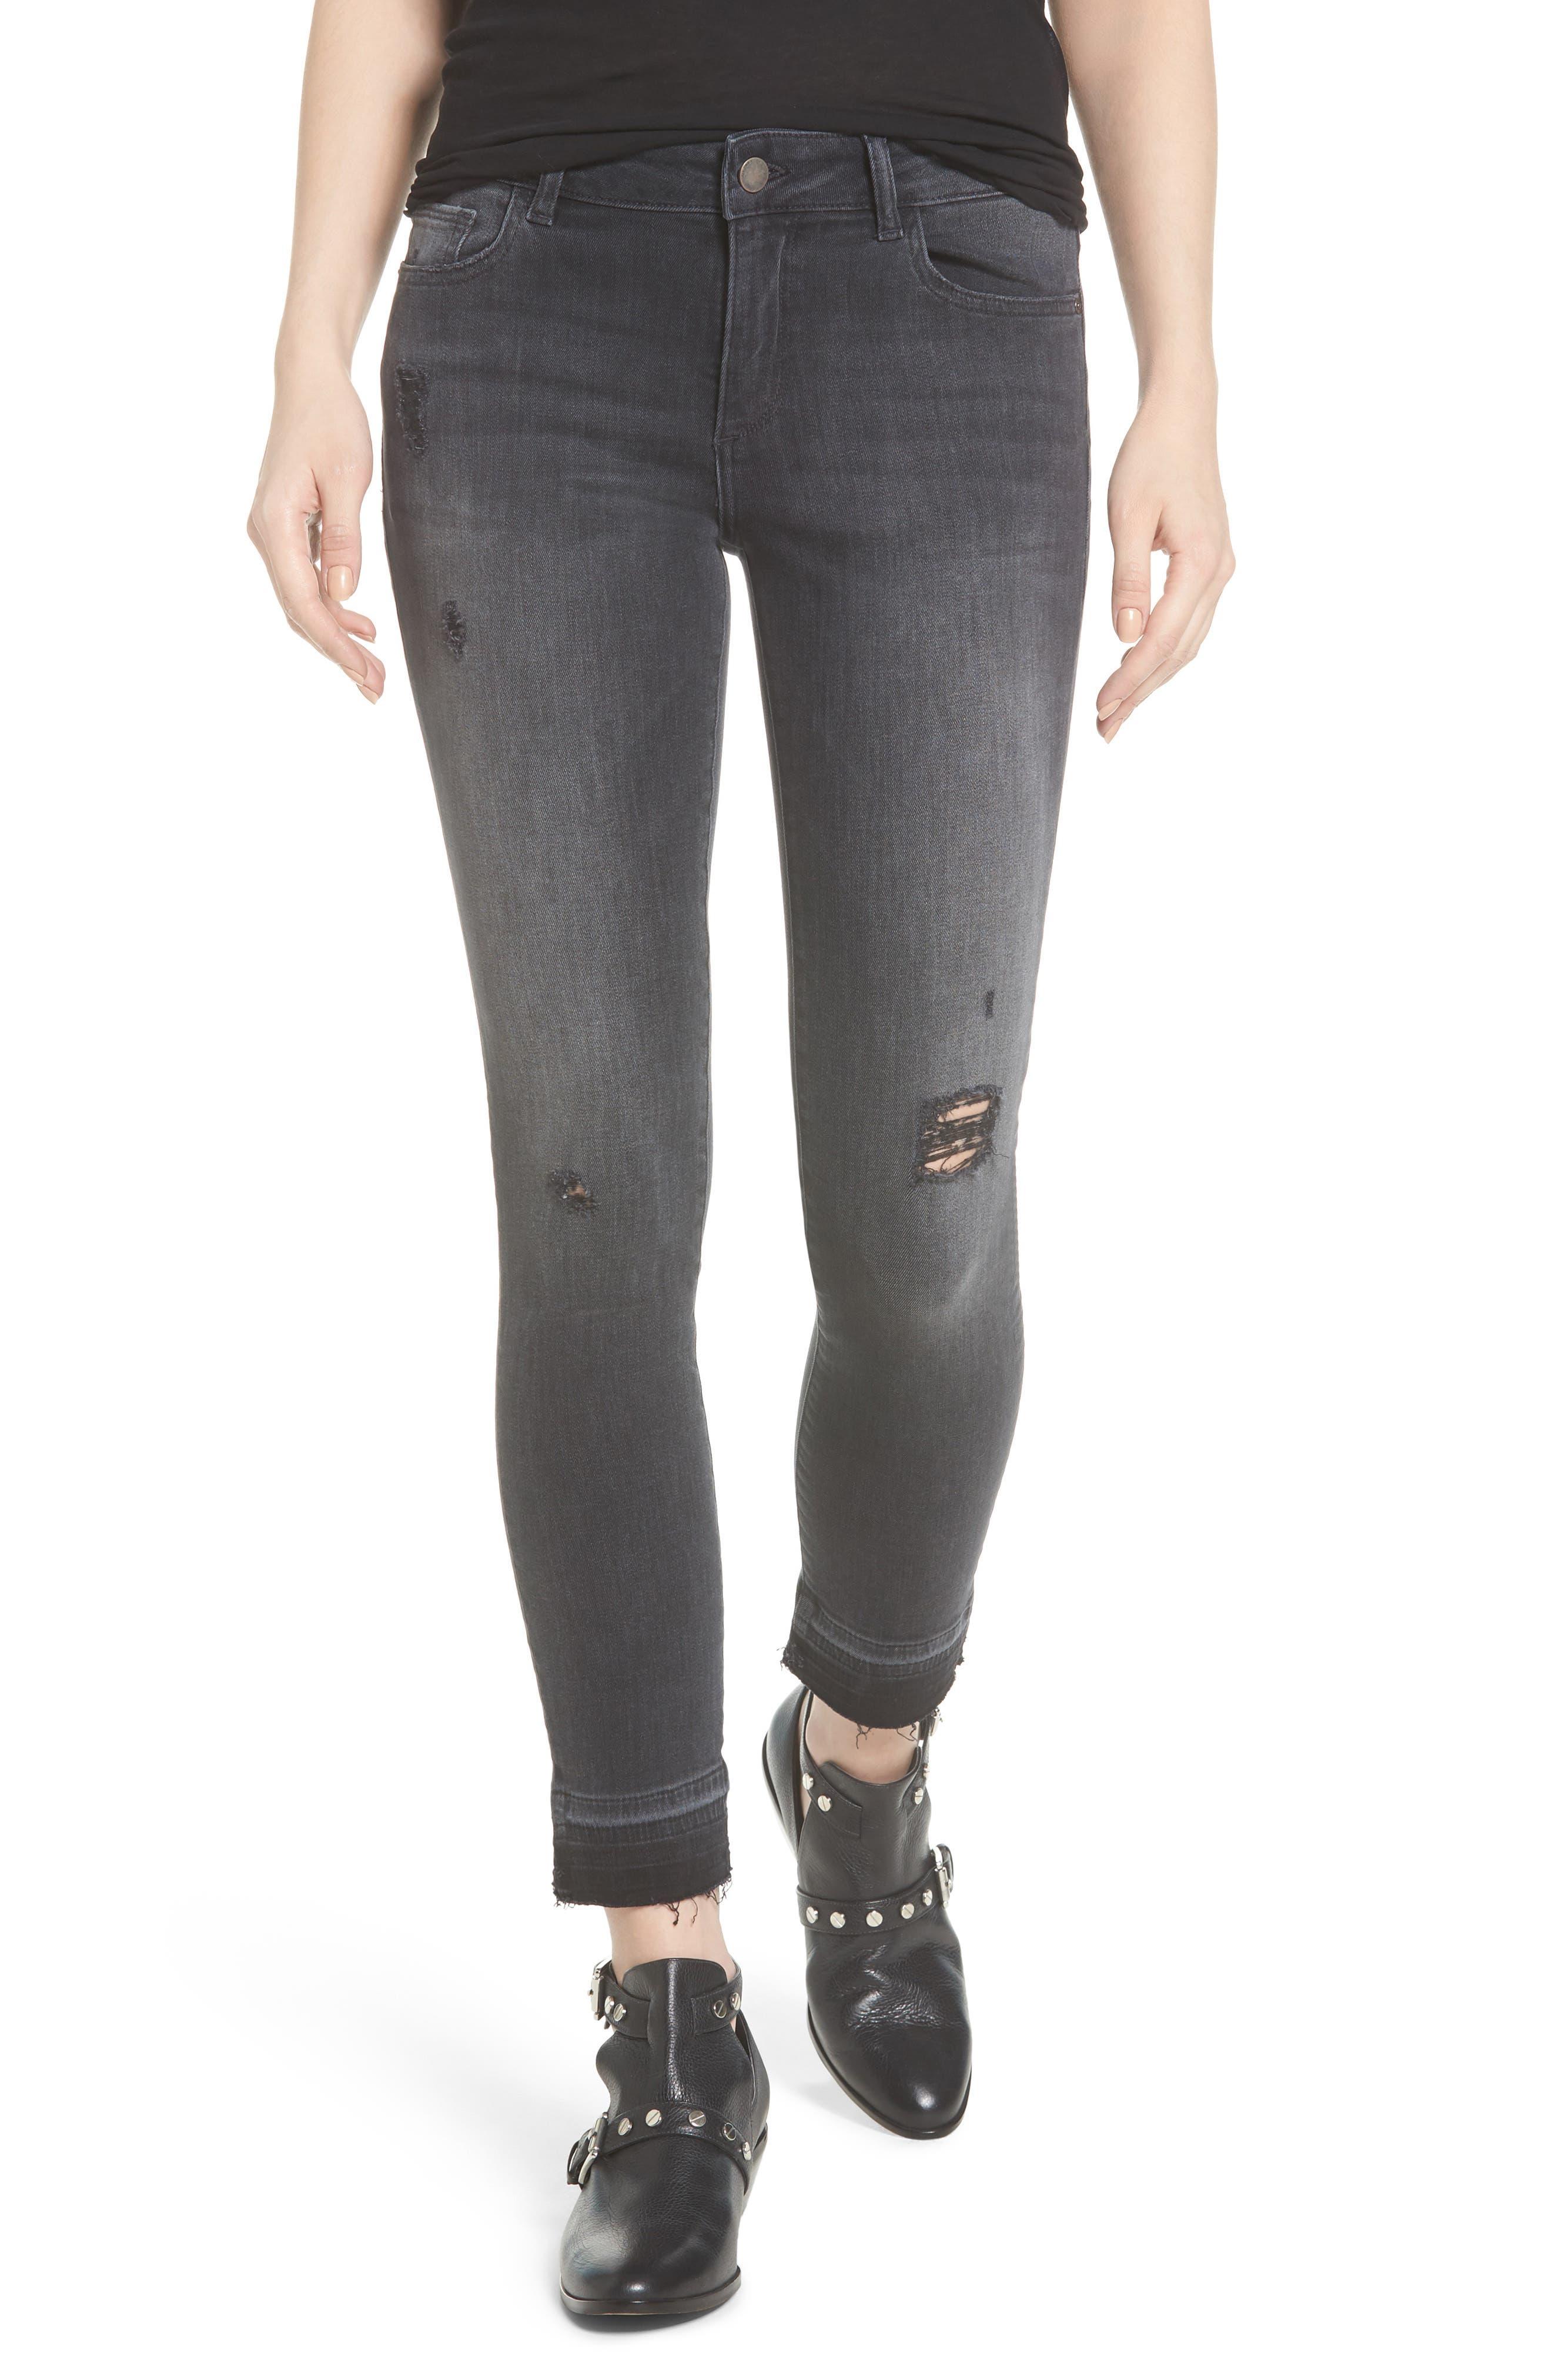 Main Image - DL1961 Emma Power Legging Jeans (Seneca)